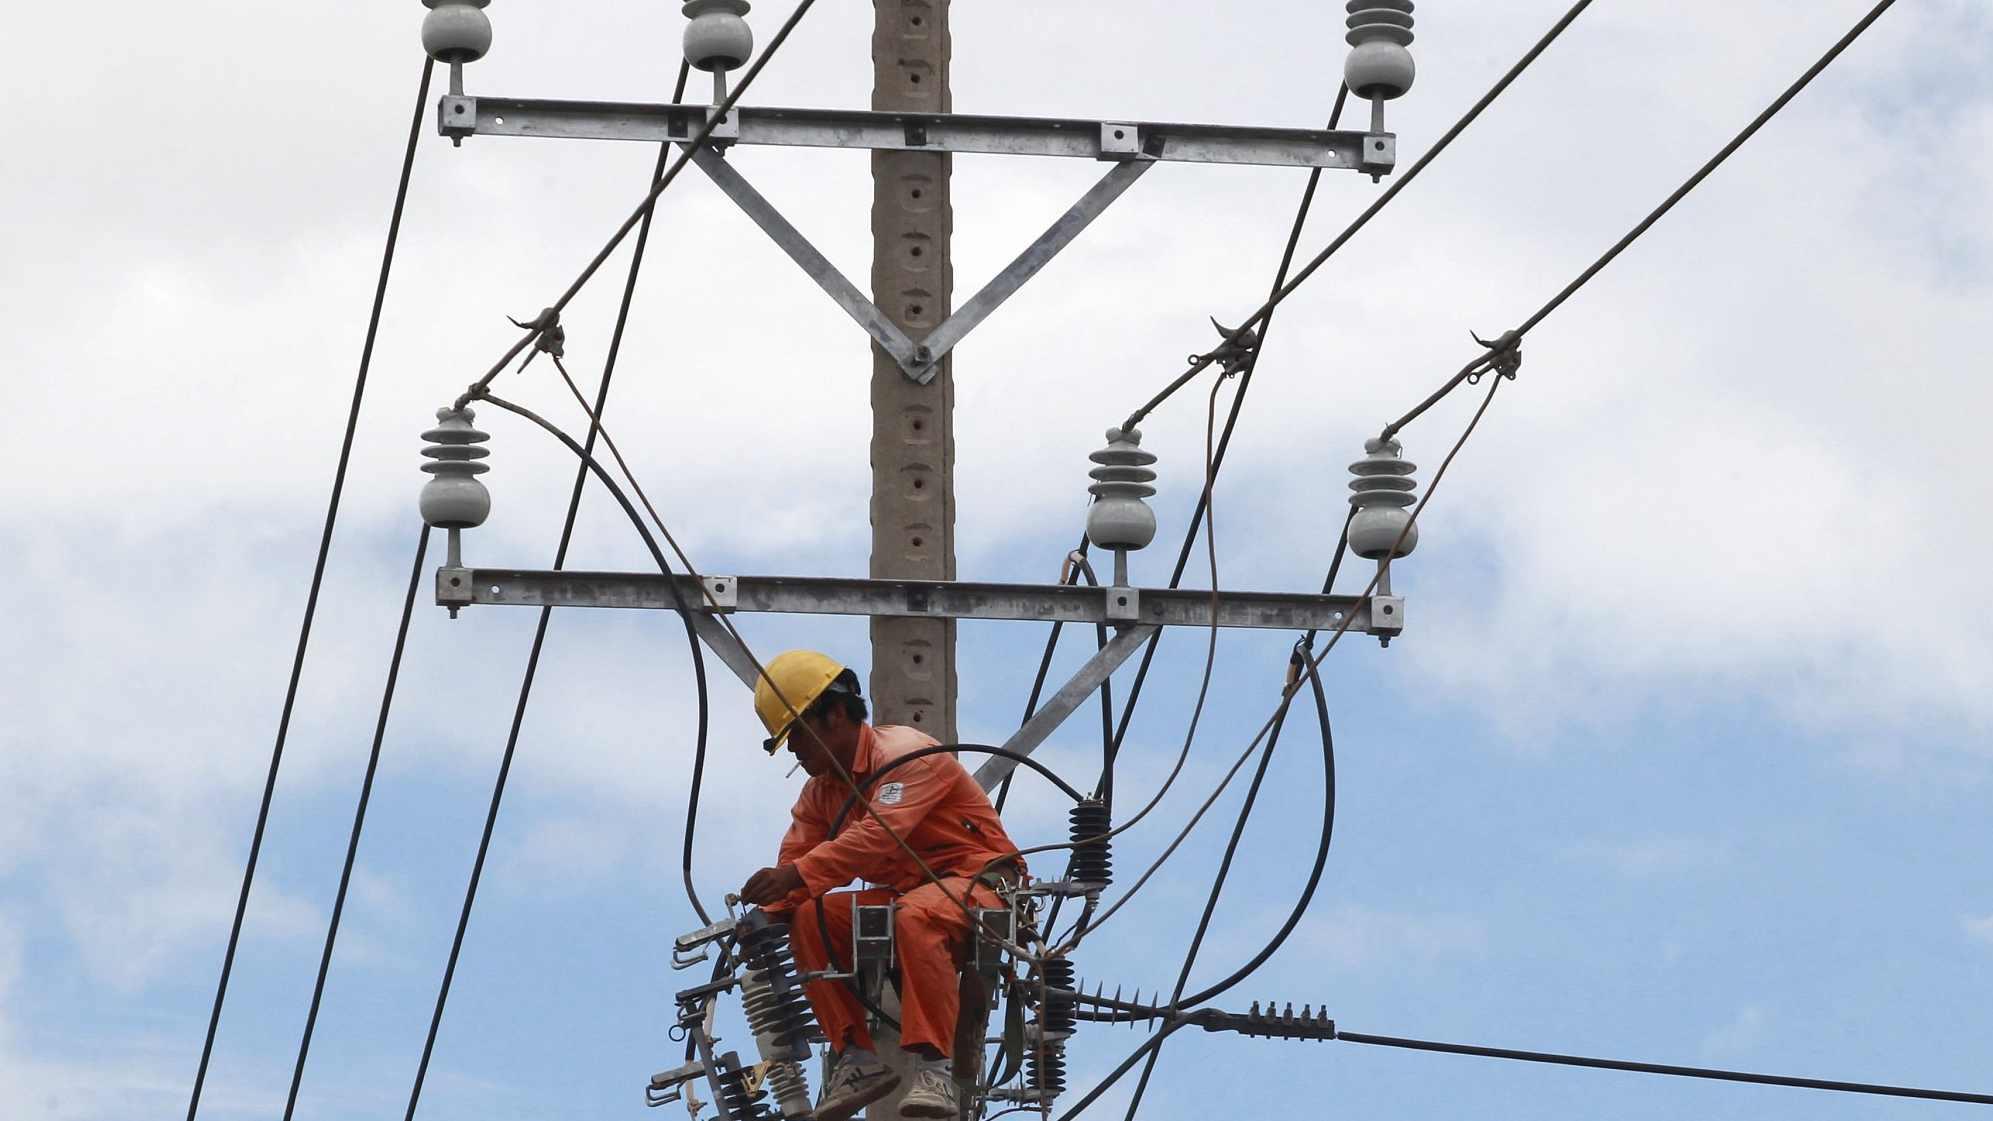 S. African electricity utility says incessant rains worsen power crisis